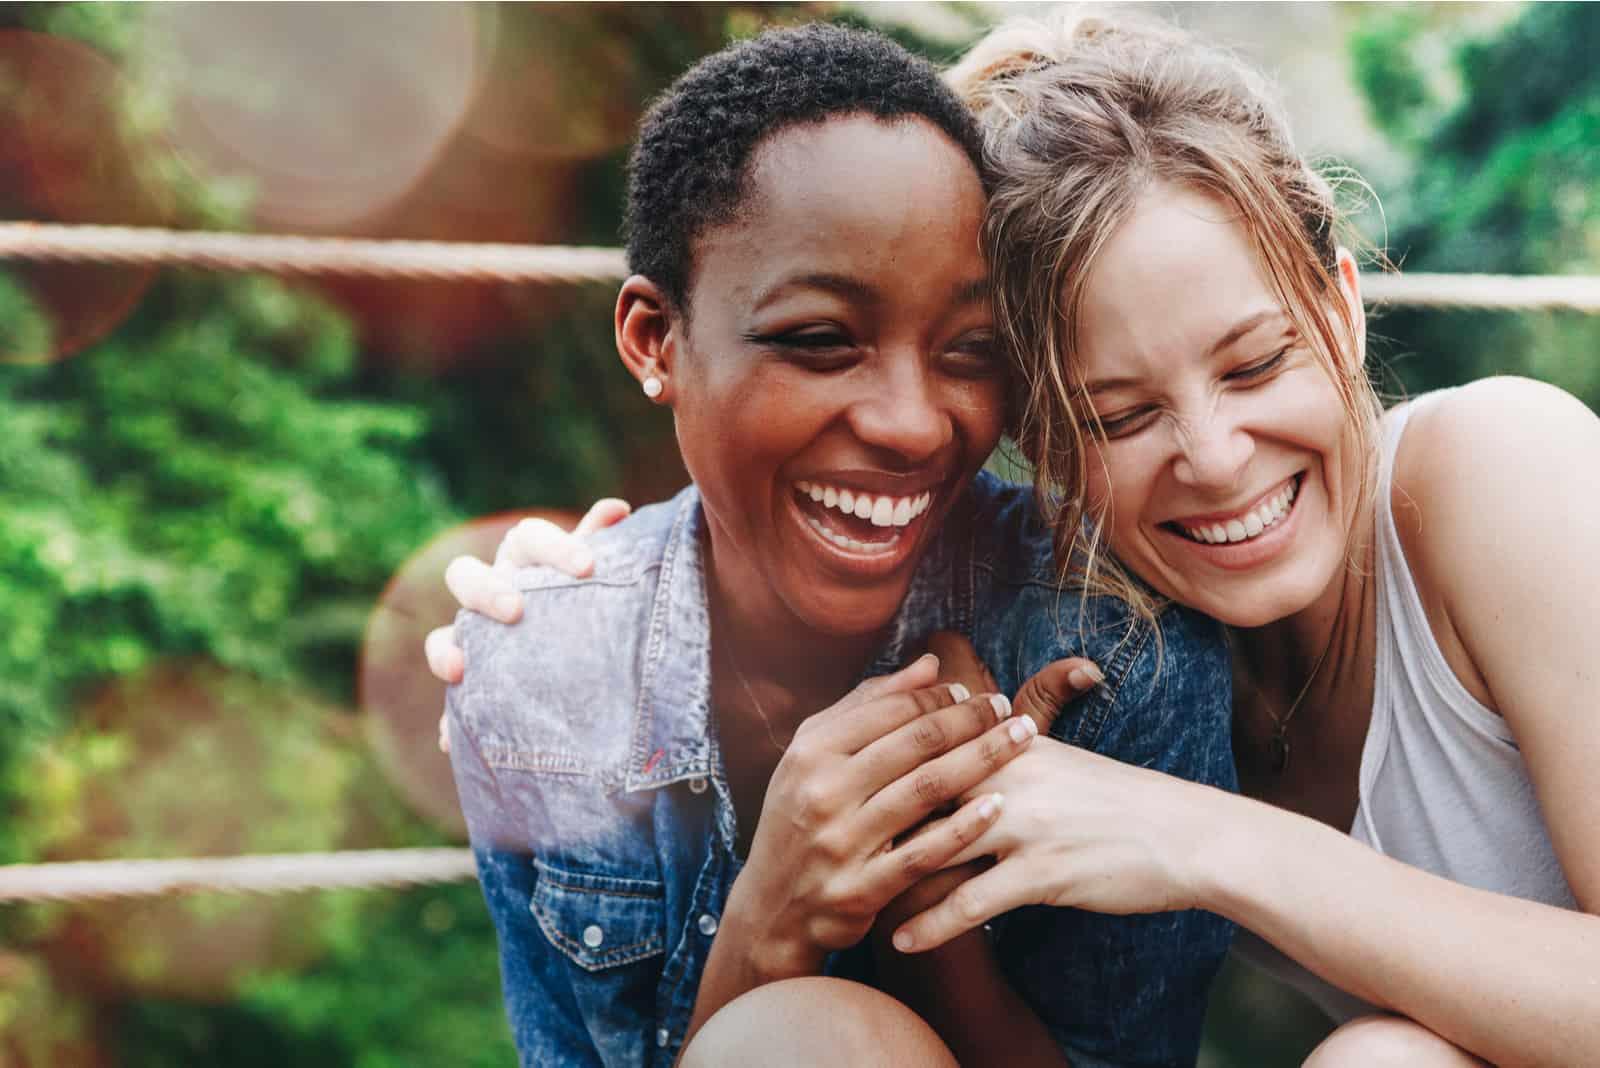 deux amis qui s'embrassent en riant